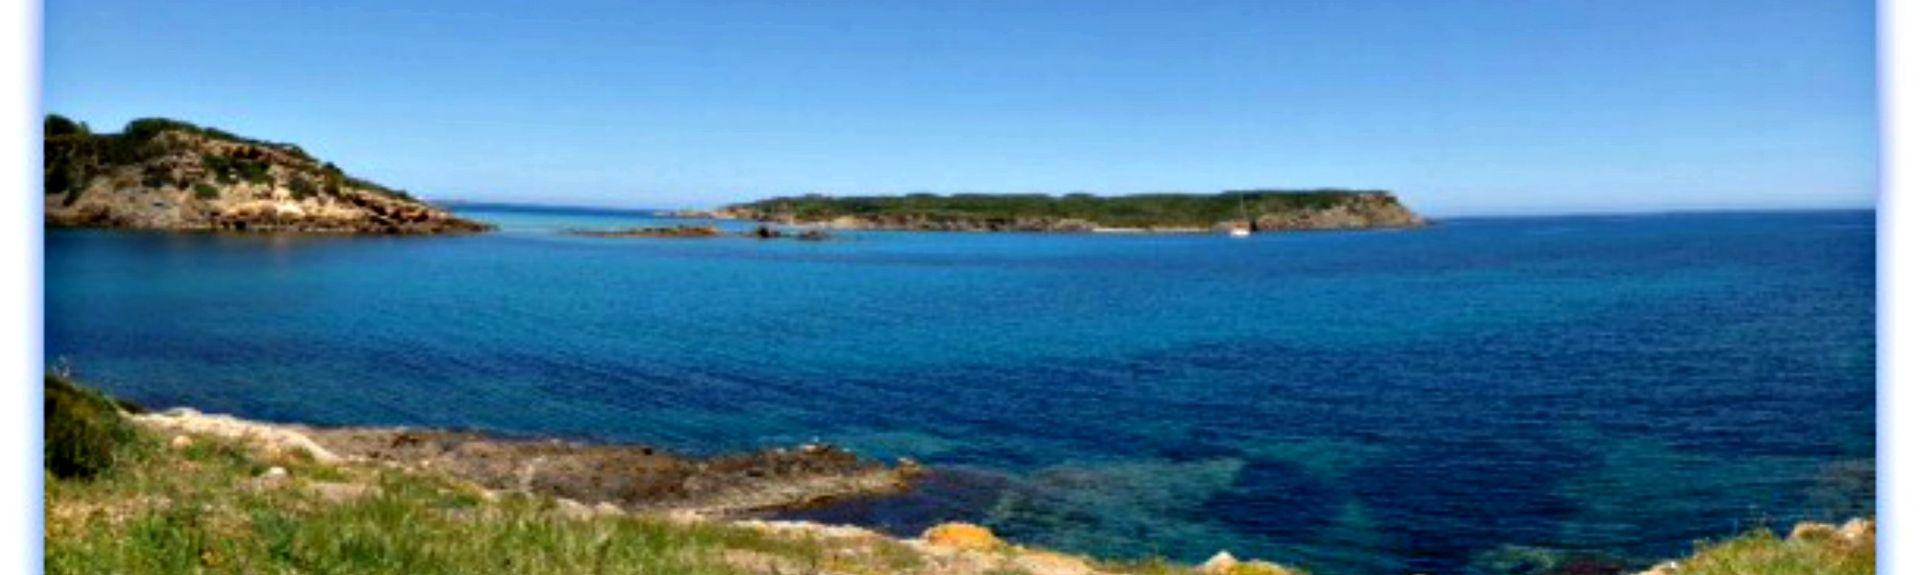 Punta Prima, Ilhas Baleares, Espanha